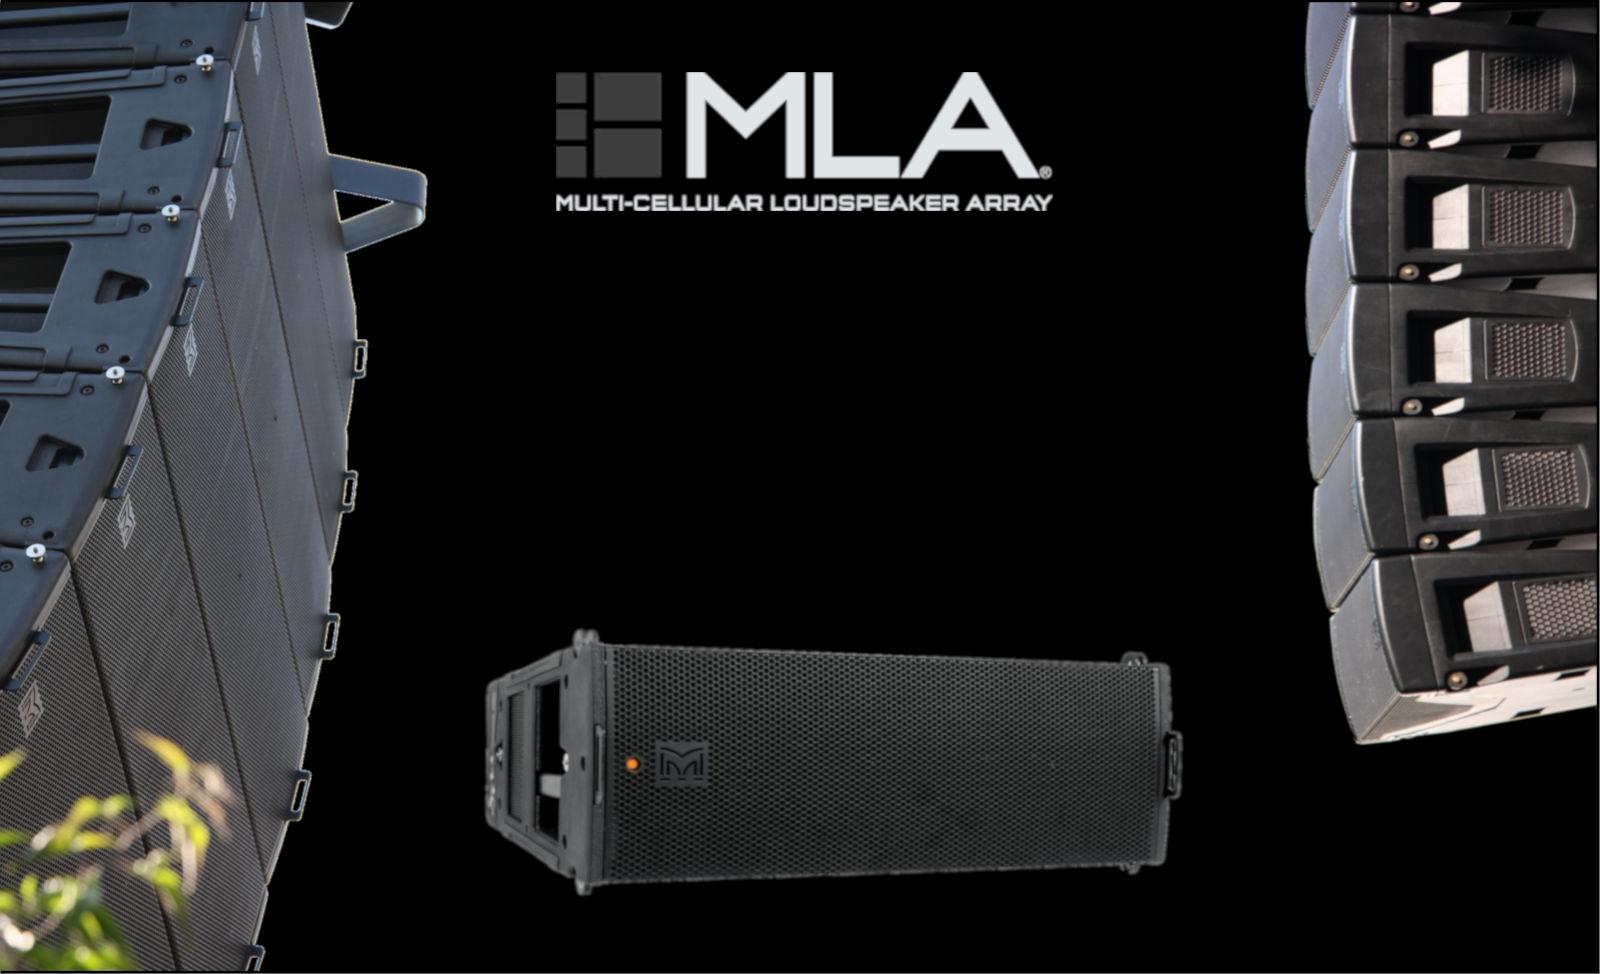 MLA, MLA Compact, MLA Mini, MLX, MSX